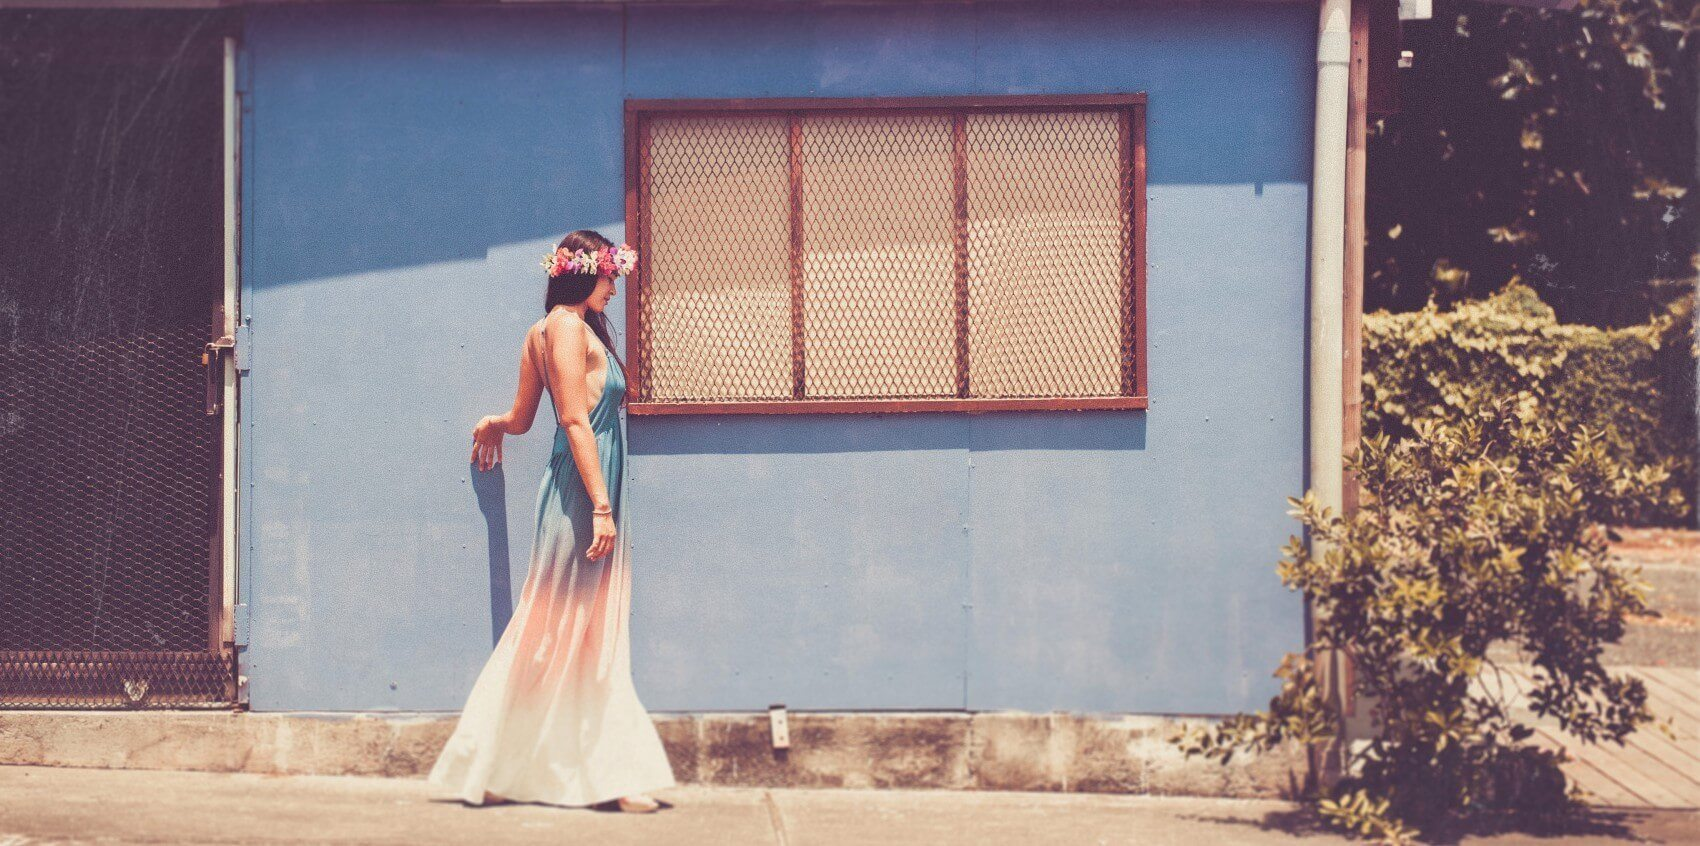 marc-gerard-photographe-mariage-montpellier-reportage-mode-tahiti-8